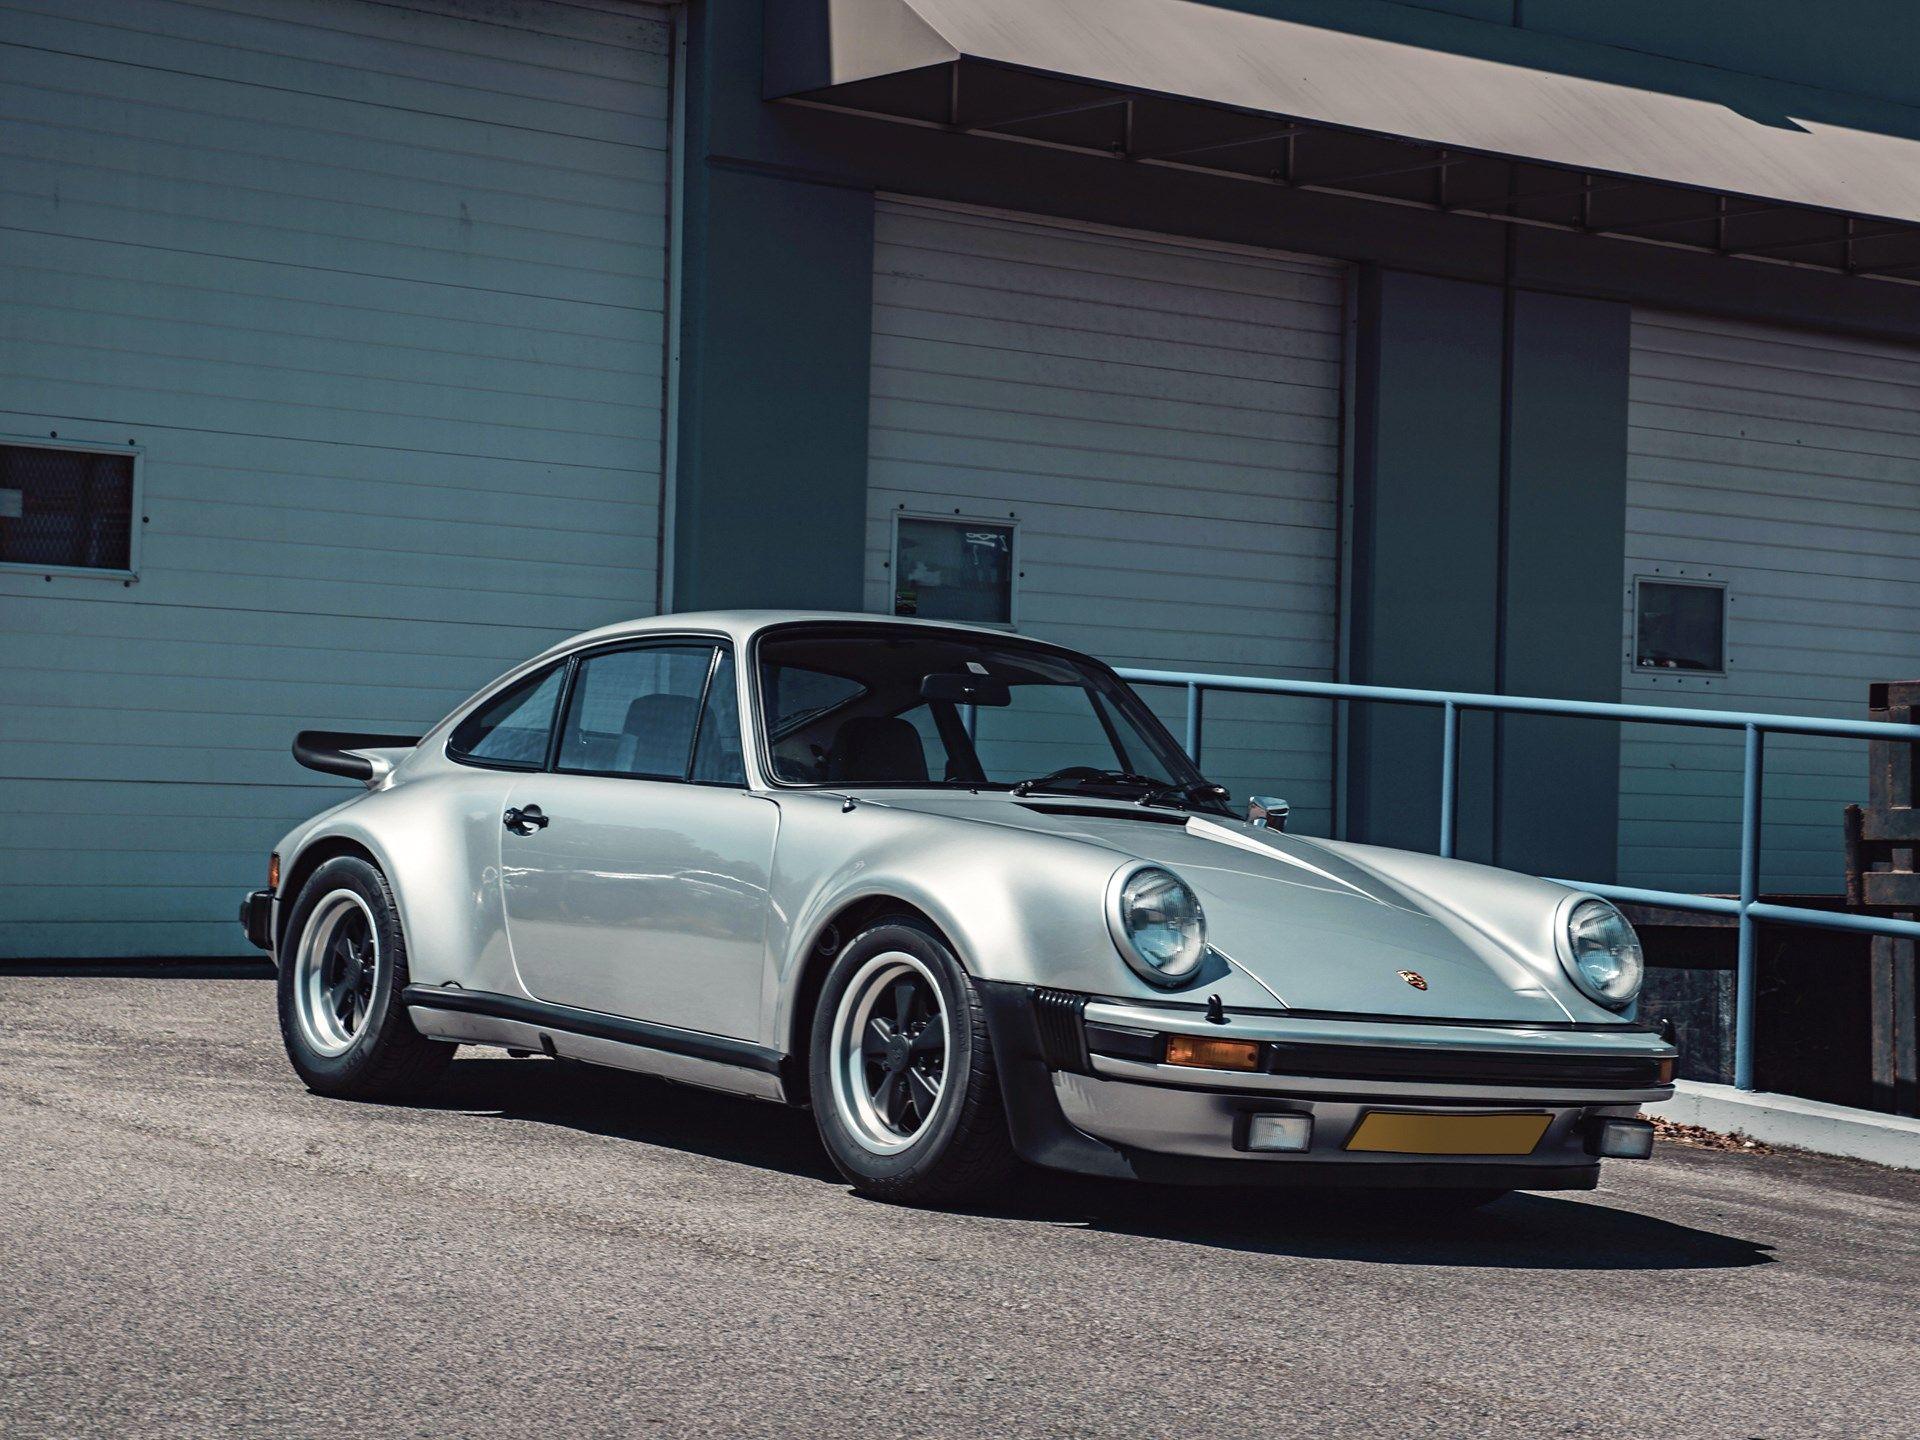 1975 Porsche 911 Turbo Porsche 911 turbo, Porsche